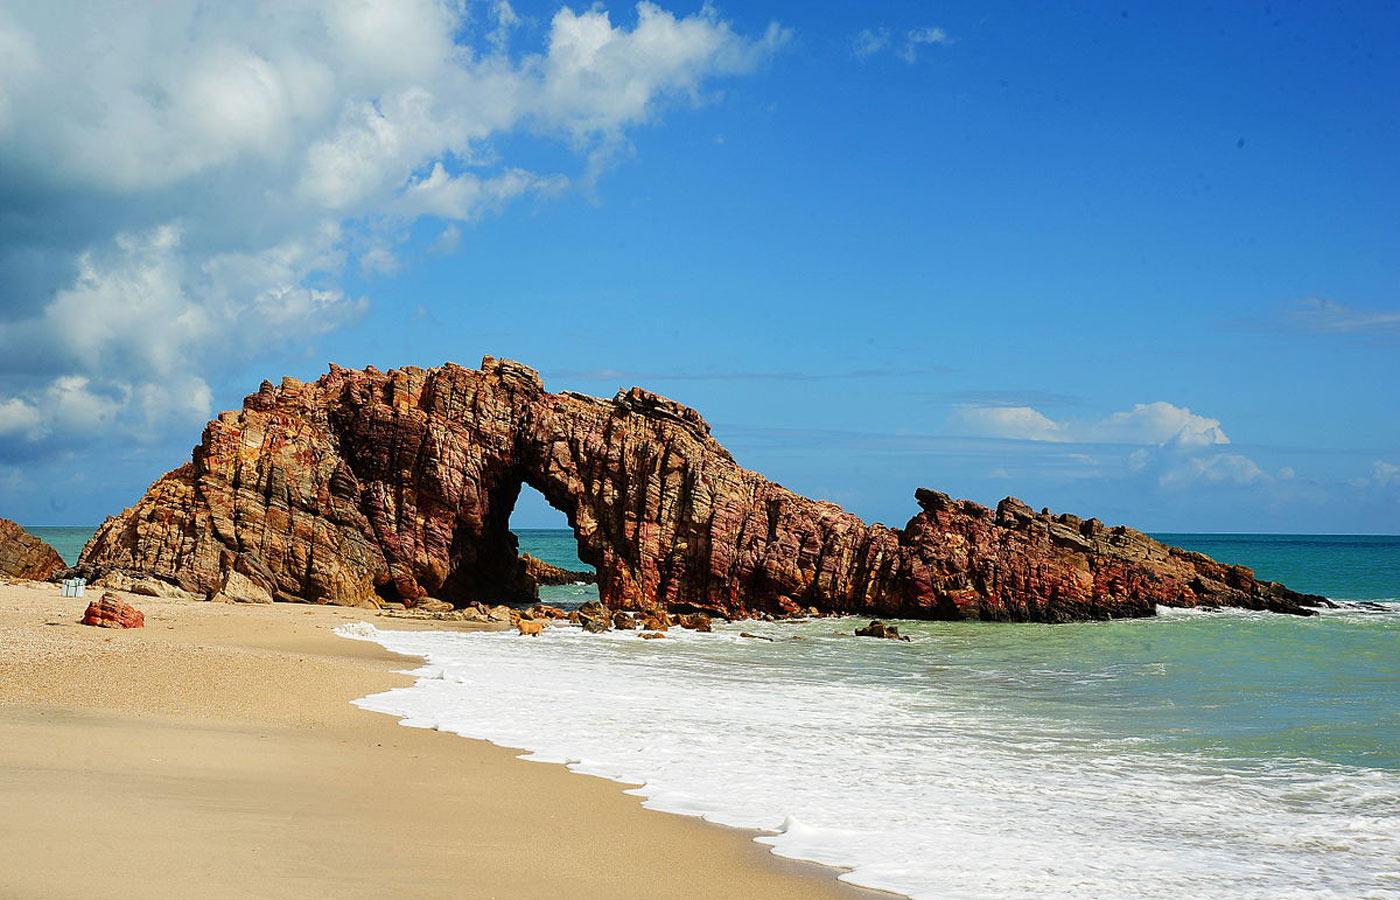 The Pedra Furada, Jericoacoara, Brazil